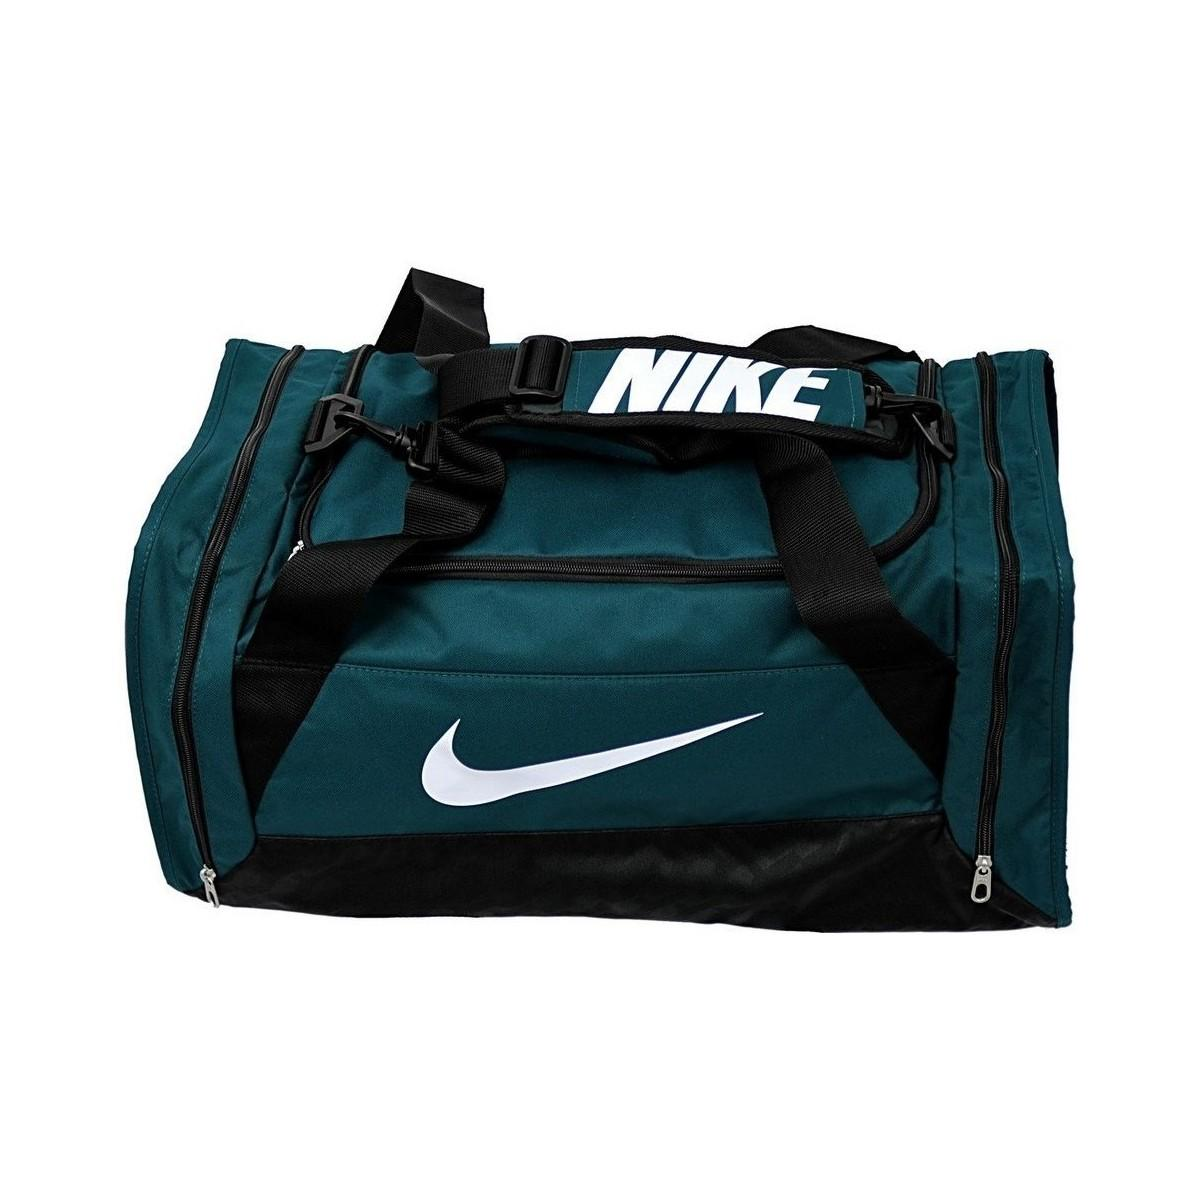 0b6f648b5df2 Nike Brasilia 6 Large Mesh Backpack Aqua- Fenix Toulouse Handball